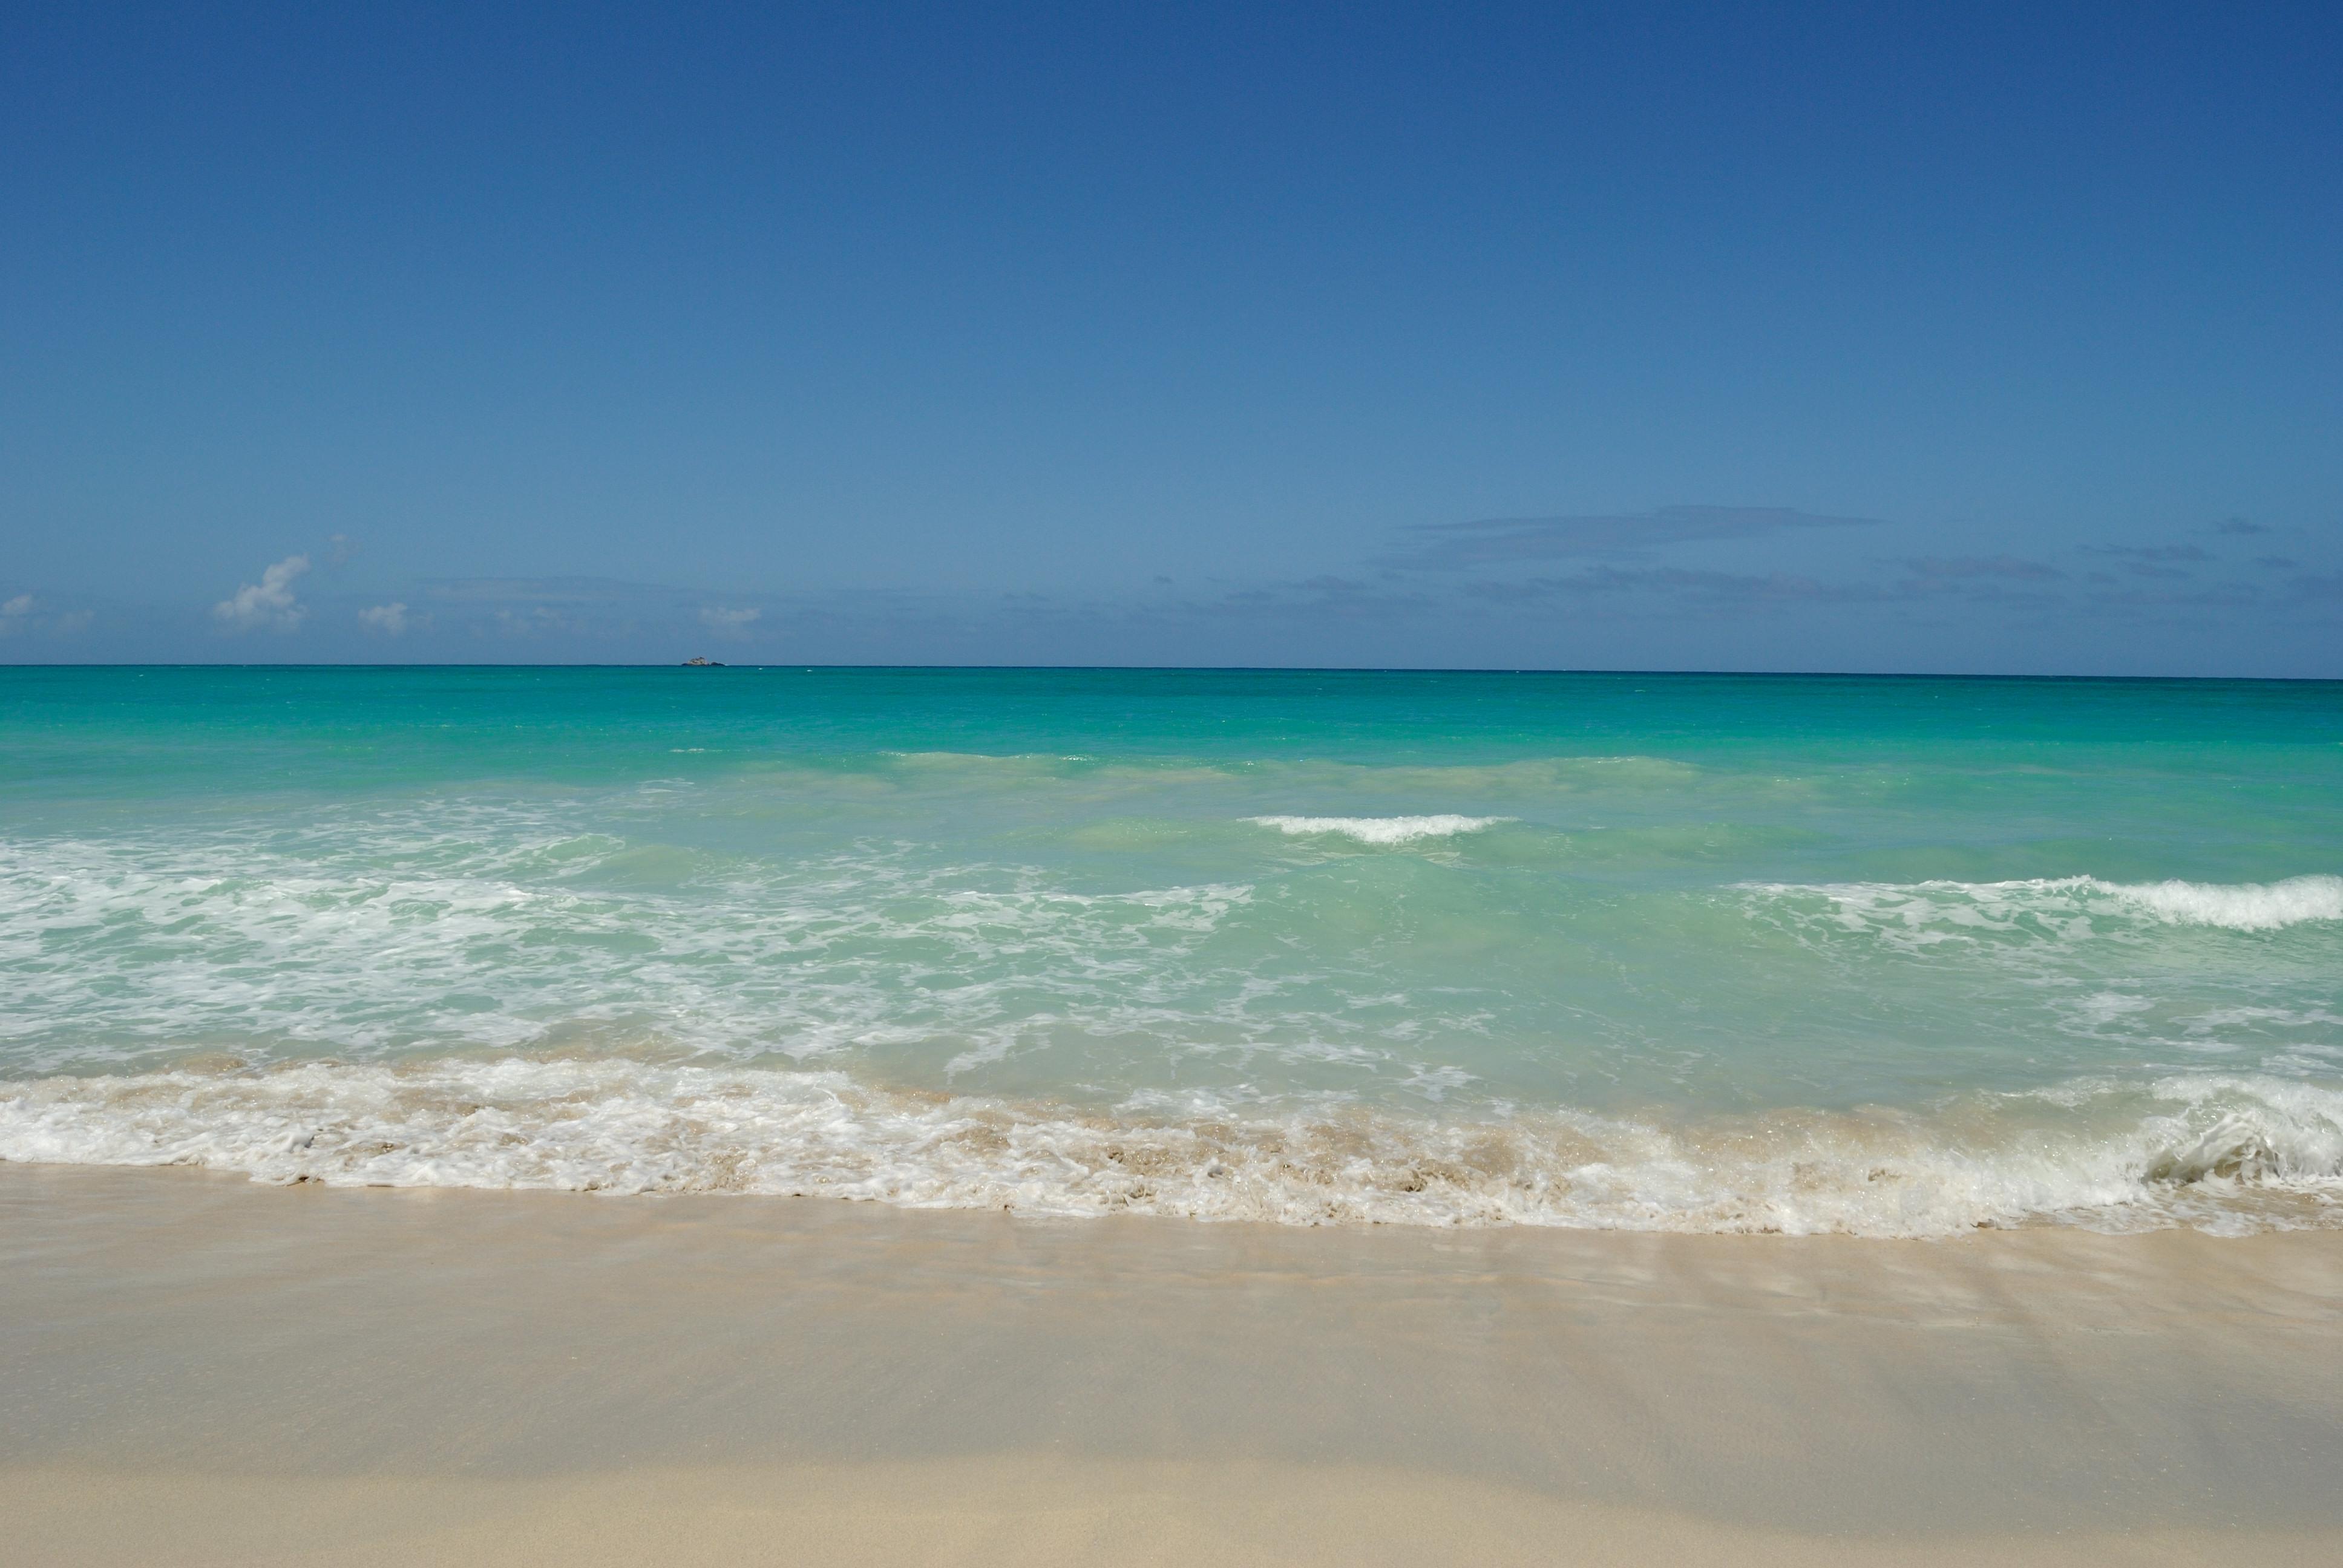 kailua beach shore flickr photo sharing